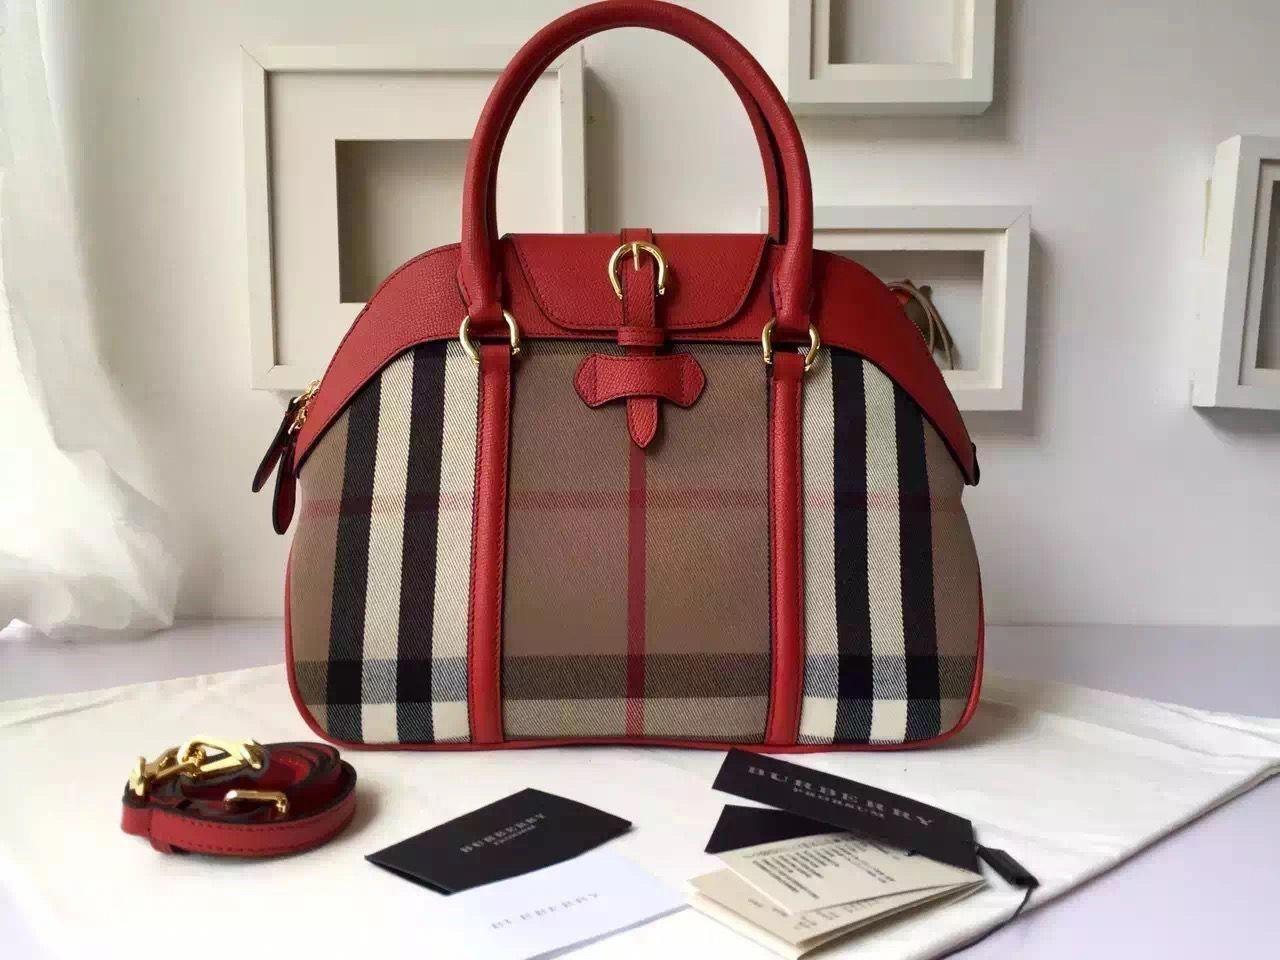 burberry handbags bloomingdales  Pradahandbags  8b6db9b63b740